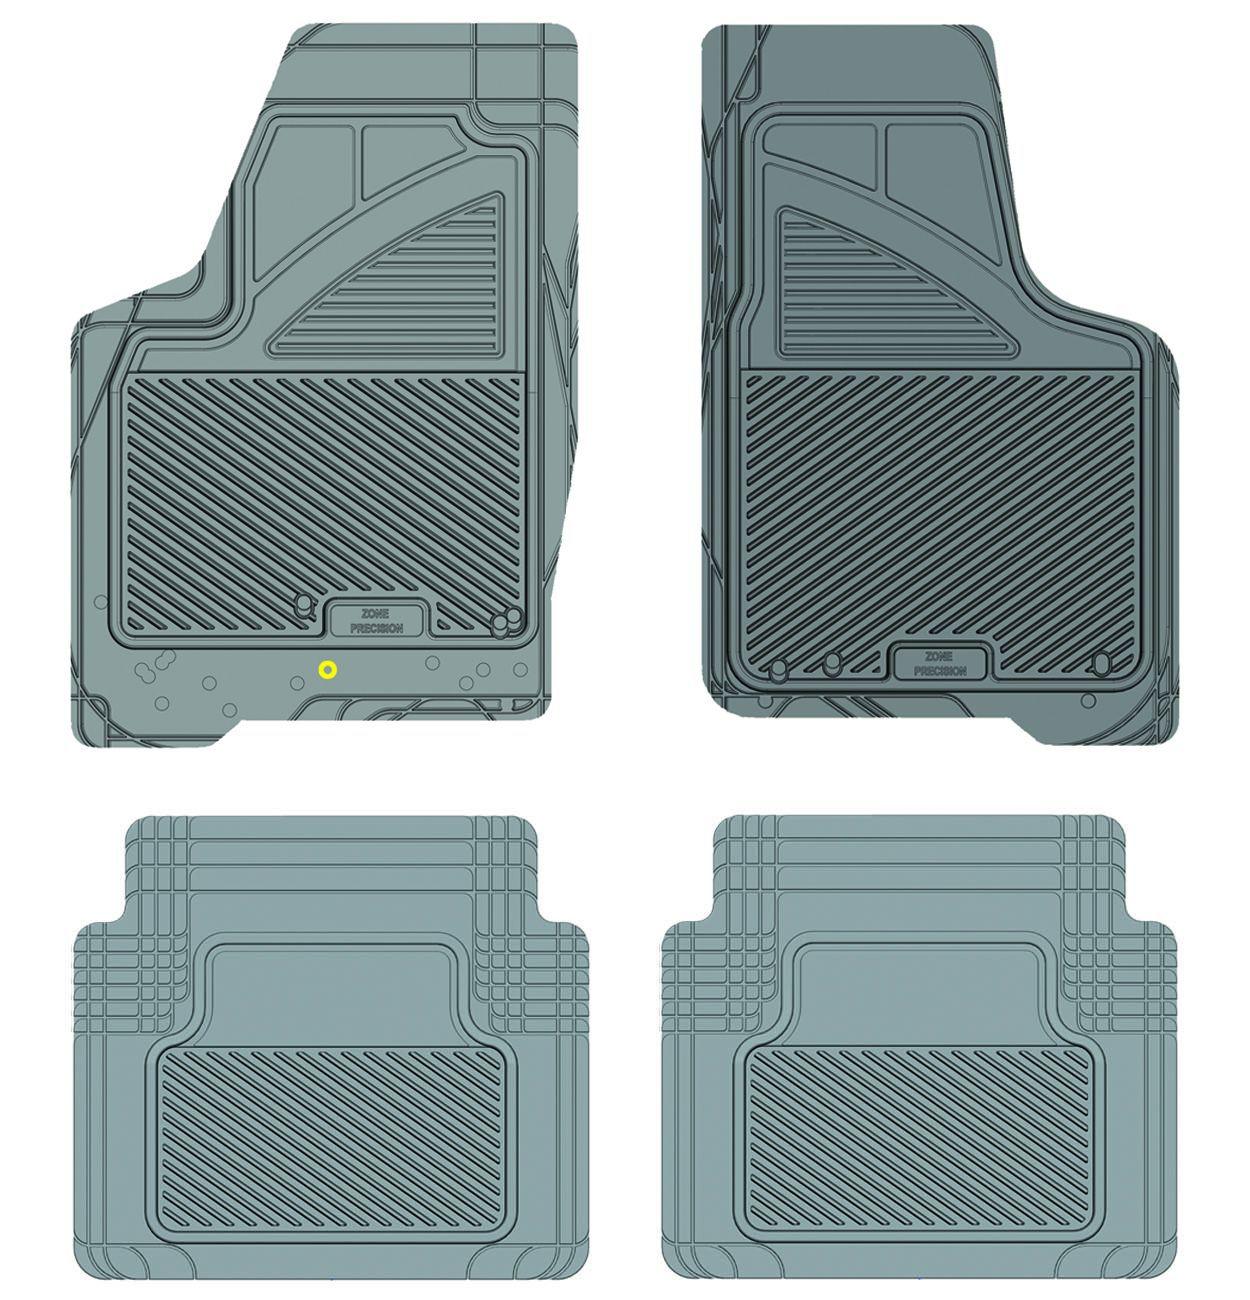 Kustom Fit Koolatron 17259 Grey Precision All Weather Kustom Fit Car Mat for 2006+ Chevrolet Impala